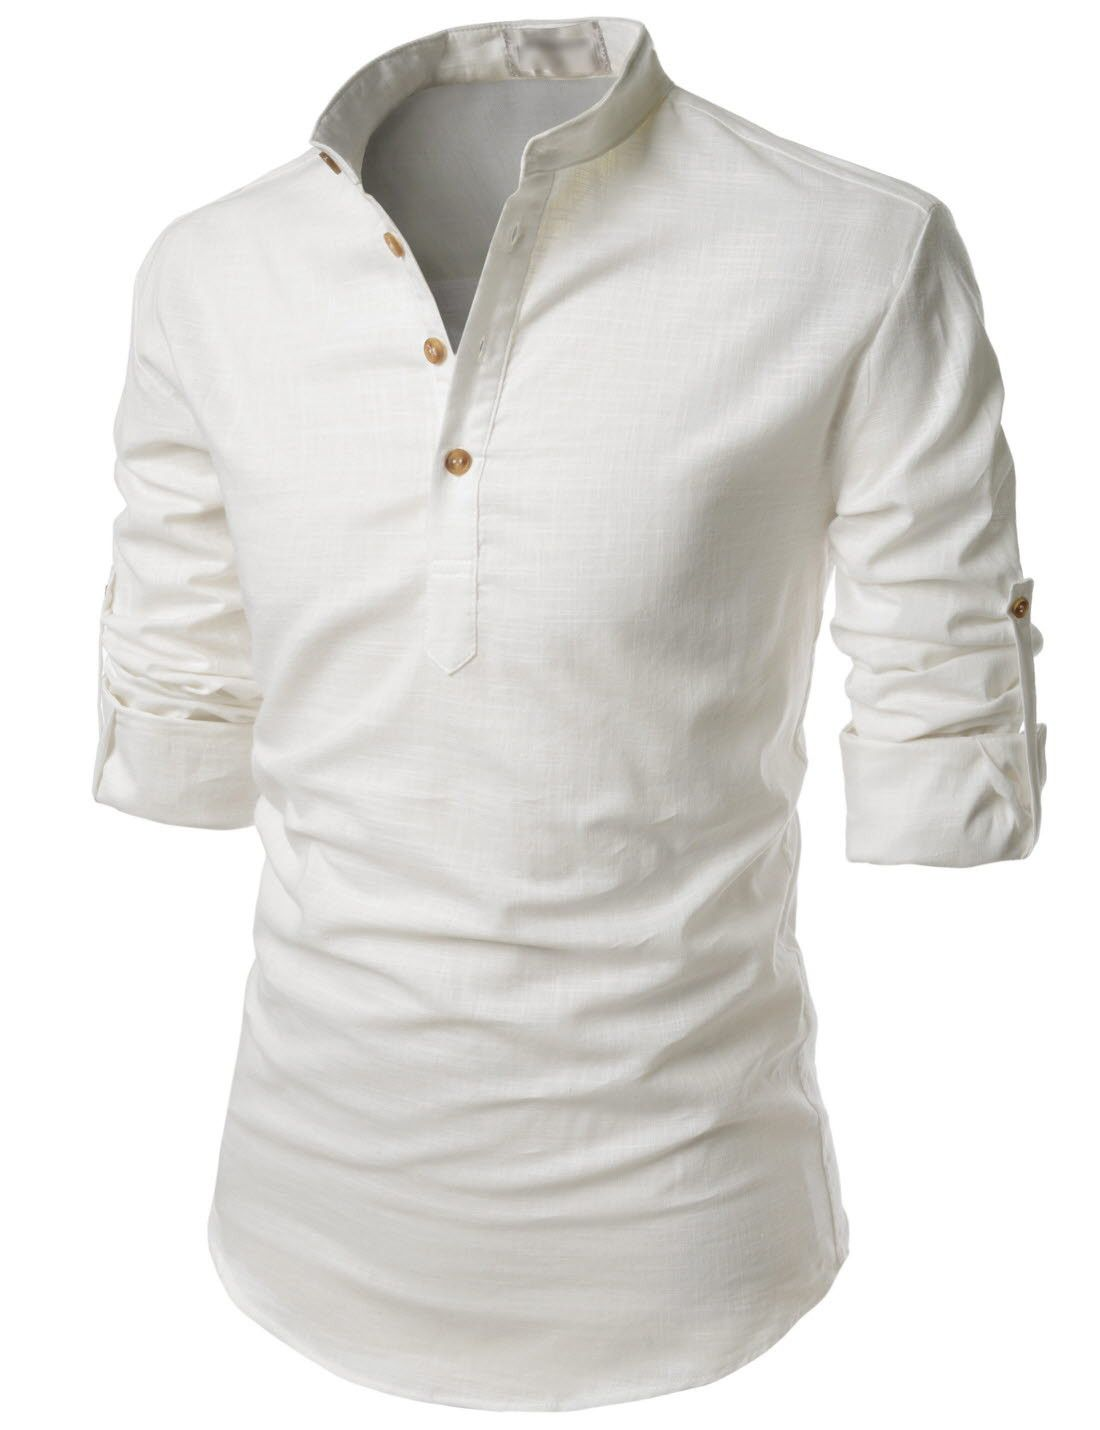 2b27a0e51 Bali Roll-up Linen Shirt   Wishlist - Chaz   Stylish mens outfits ...